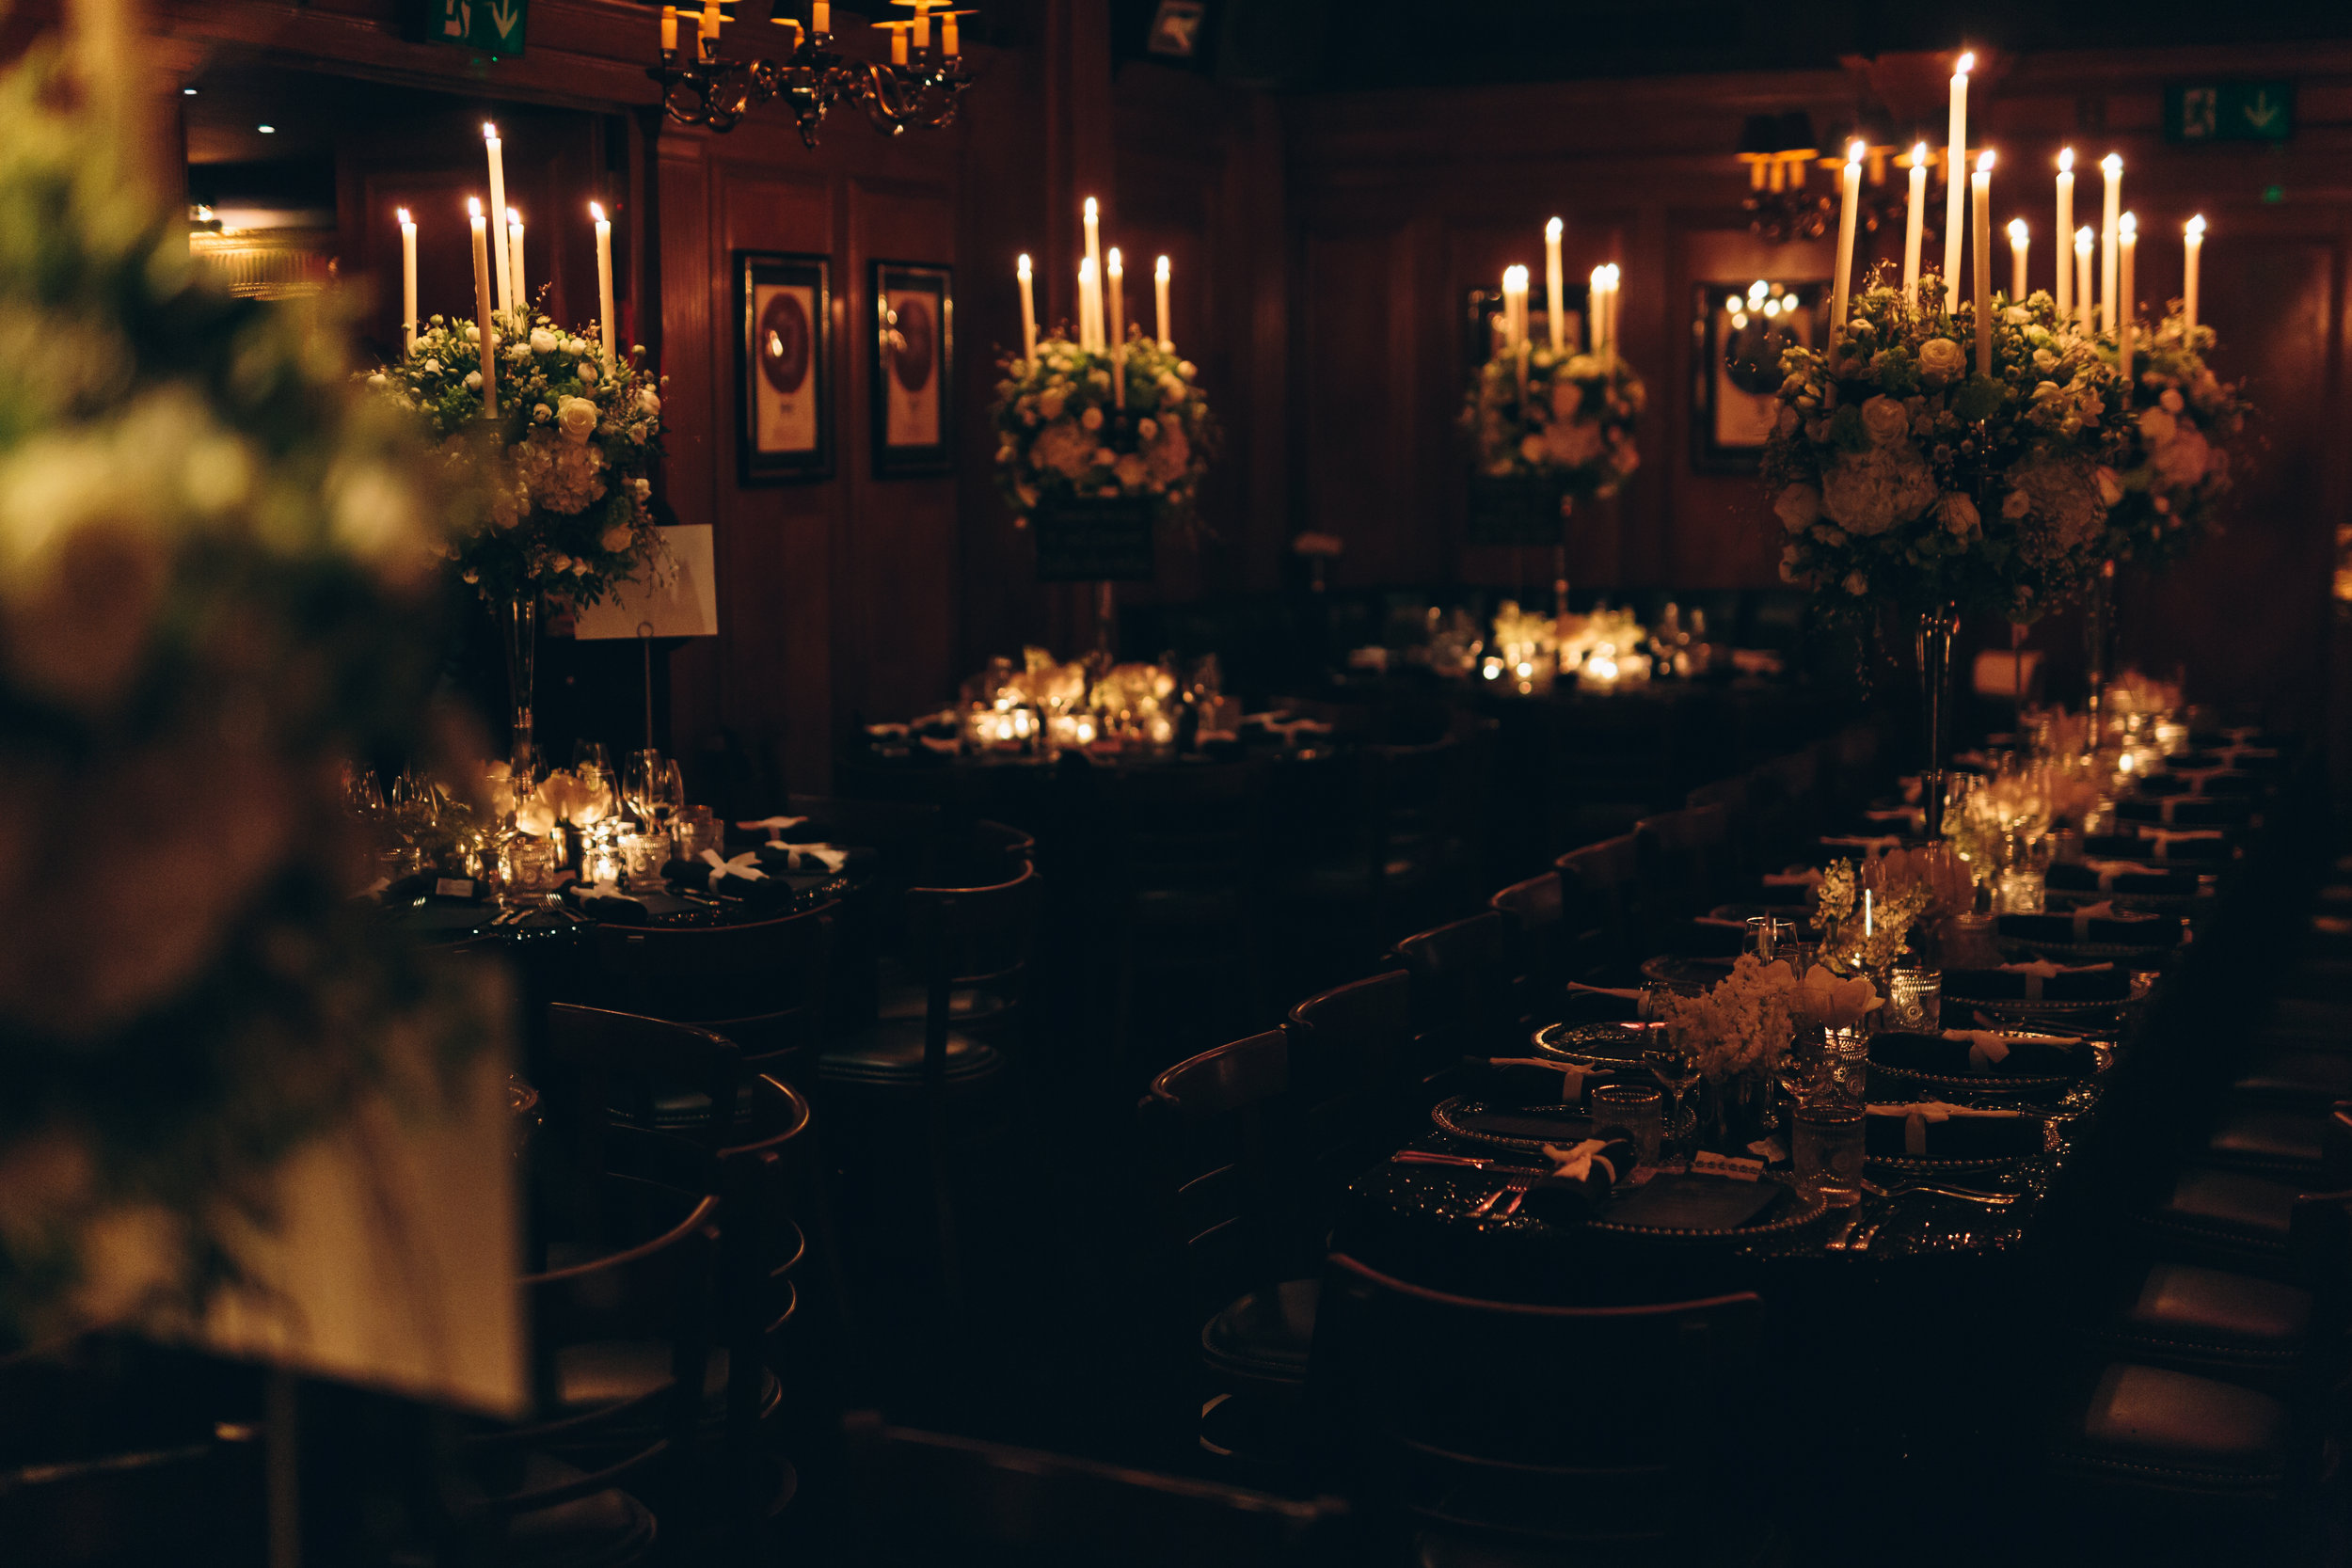 Olympia_Dinner-11.jpg